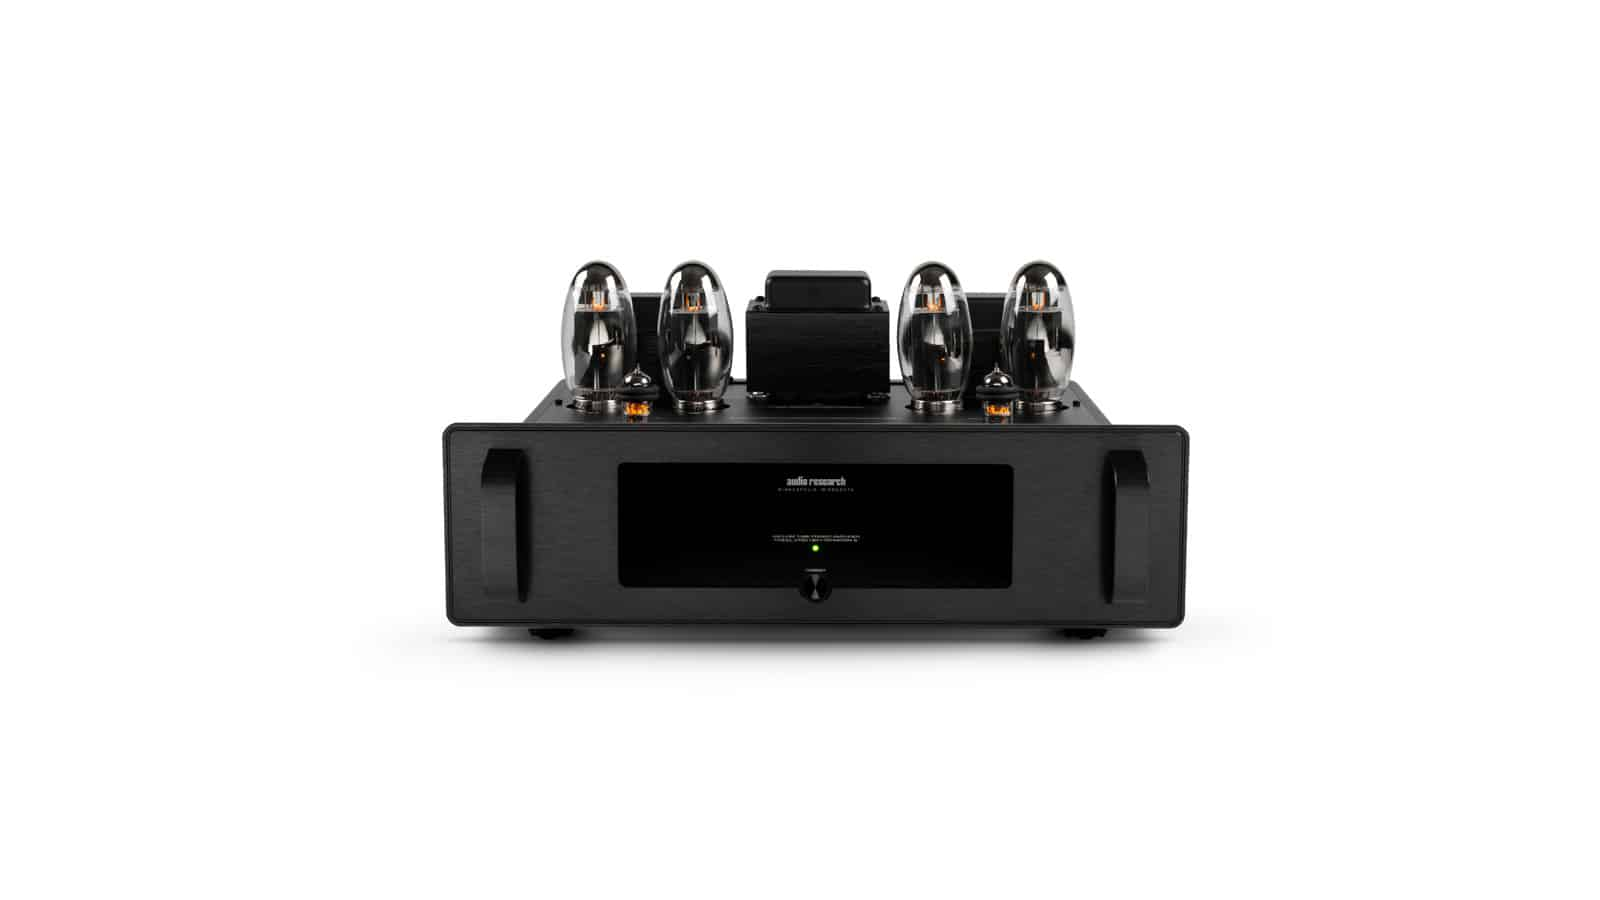 audio-research-vt80-power-amplifier